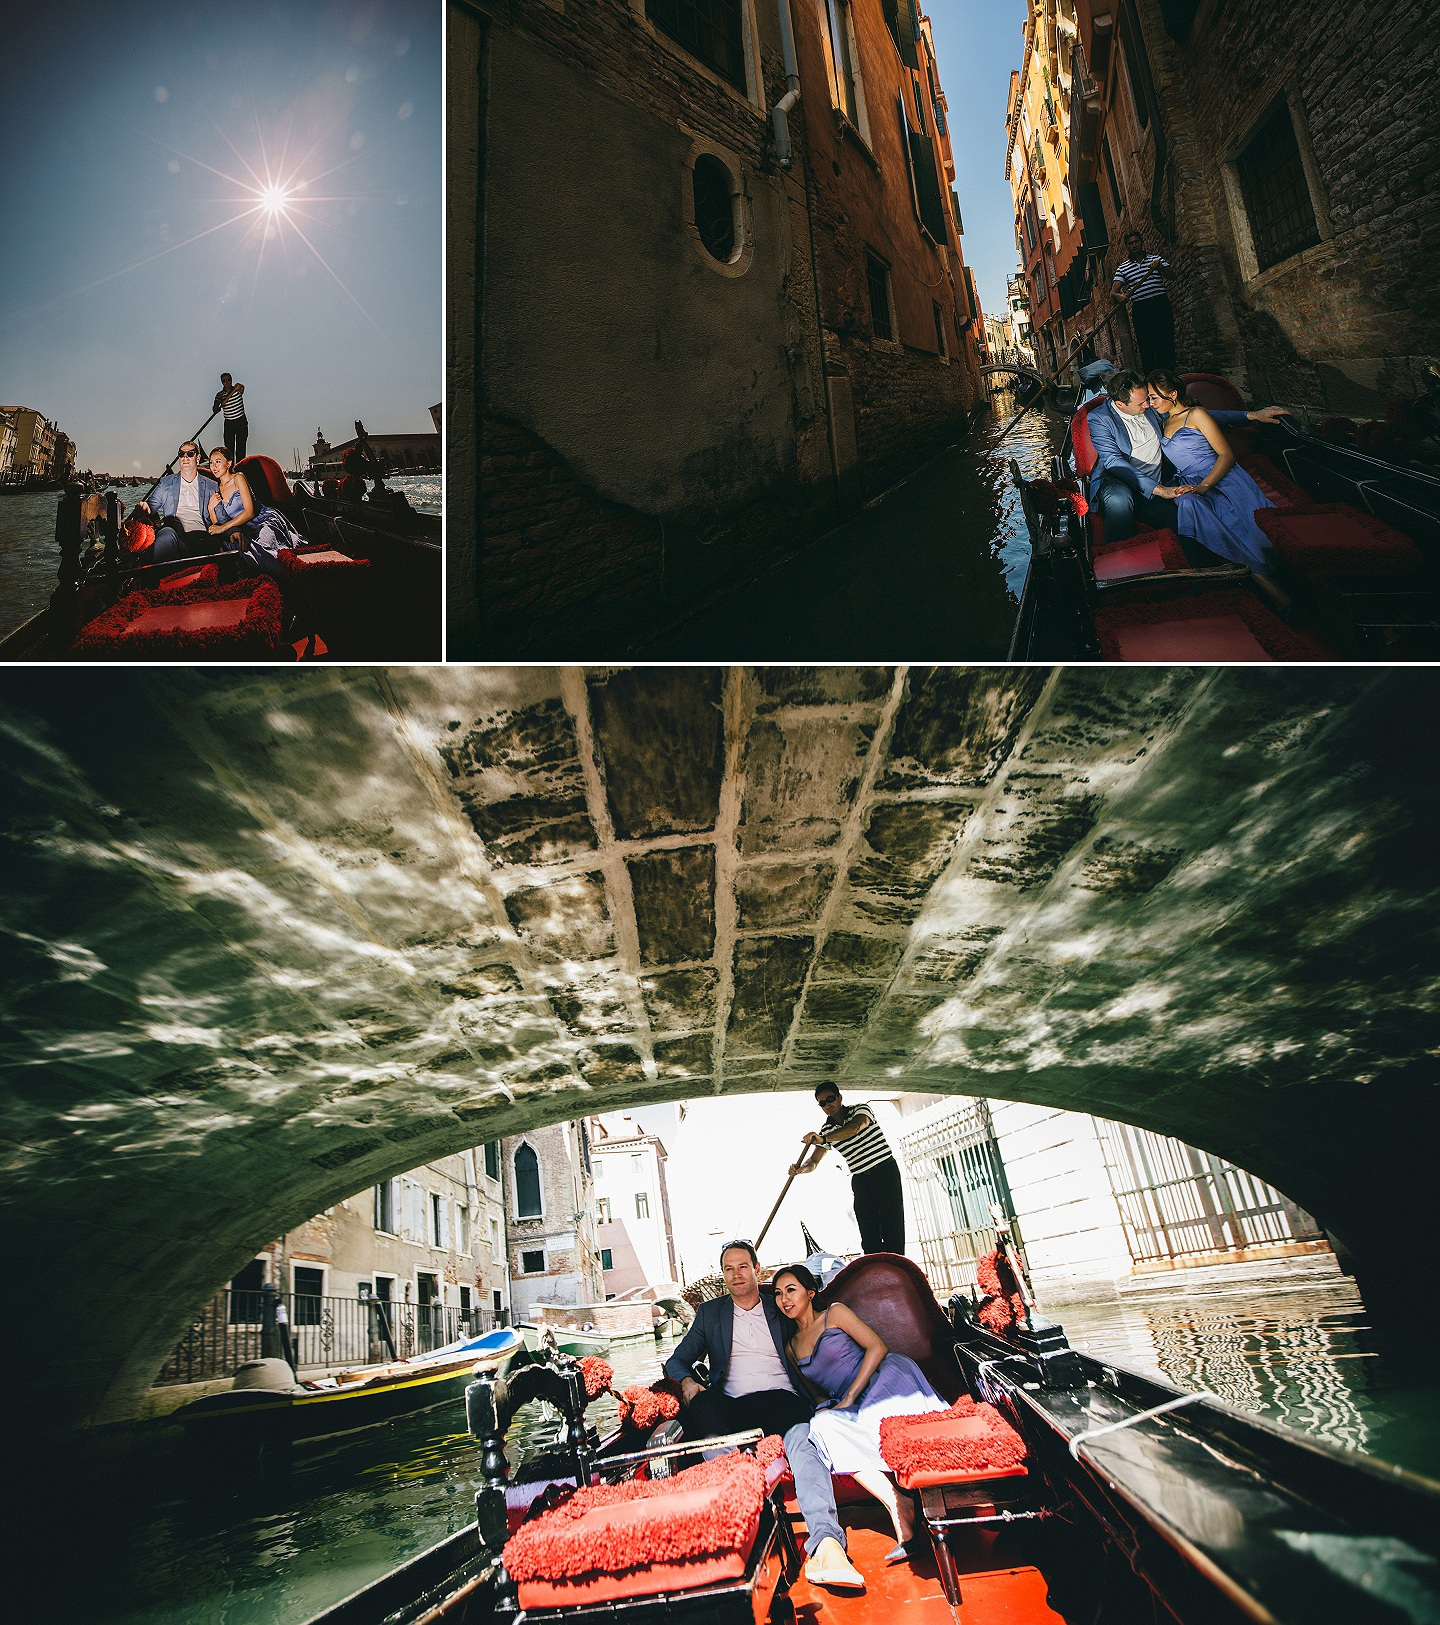 2015-PW-Venice-0014.jpg